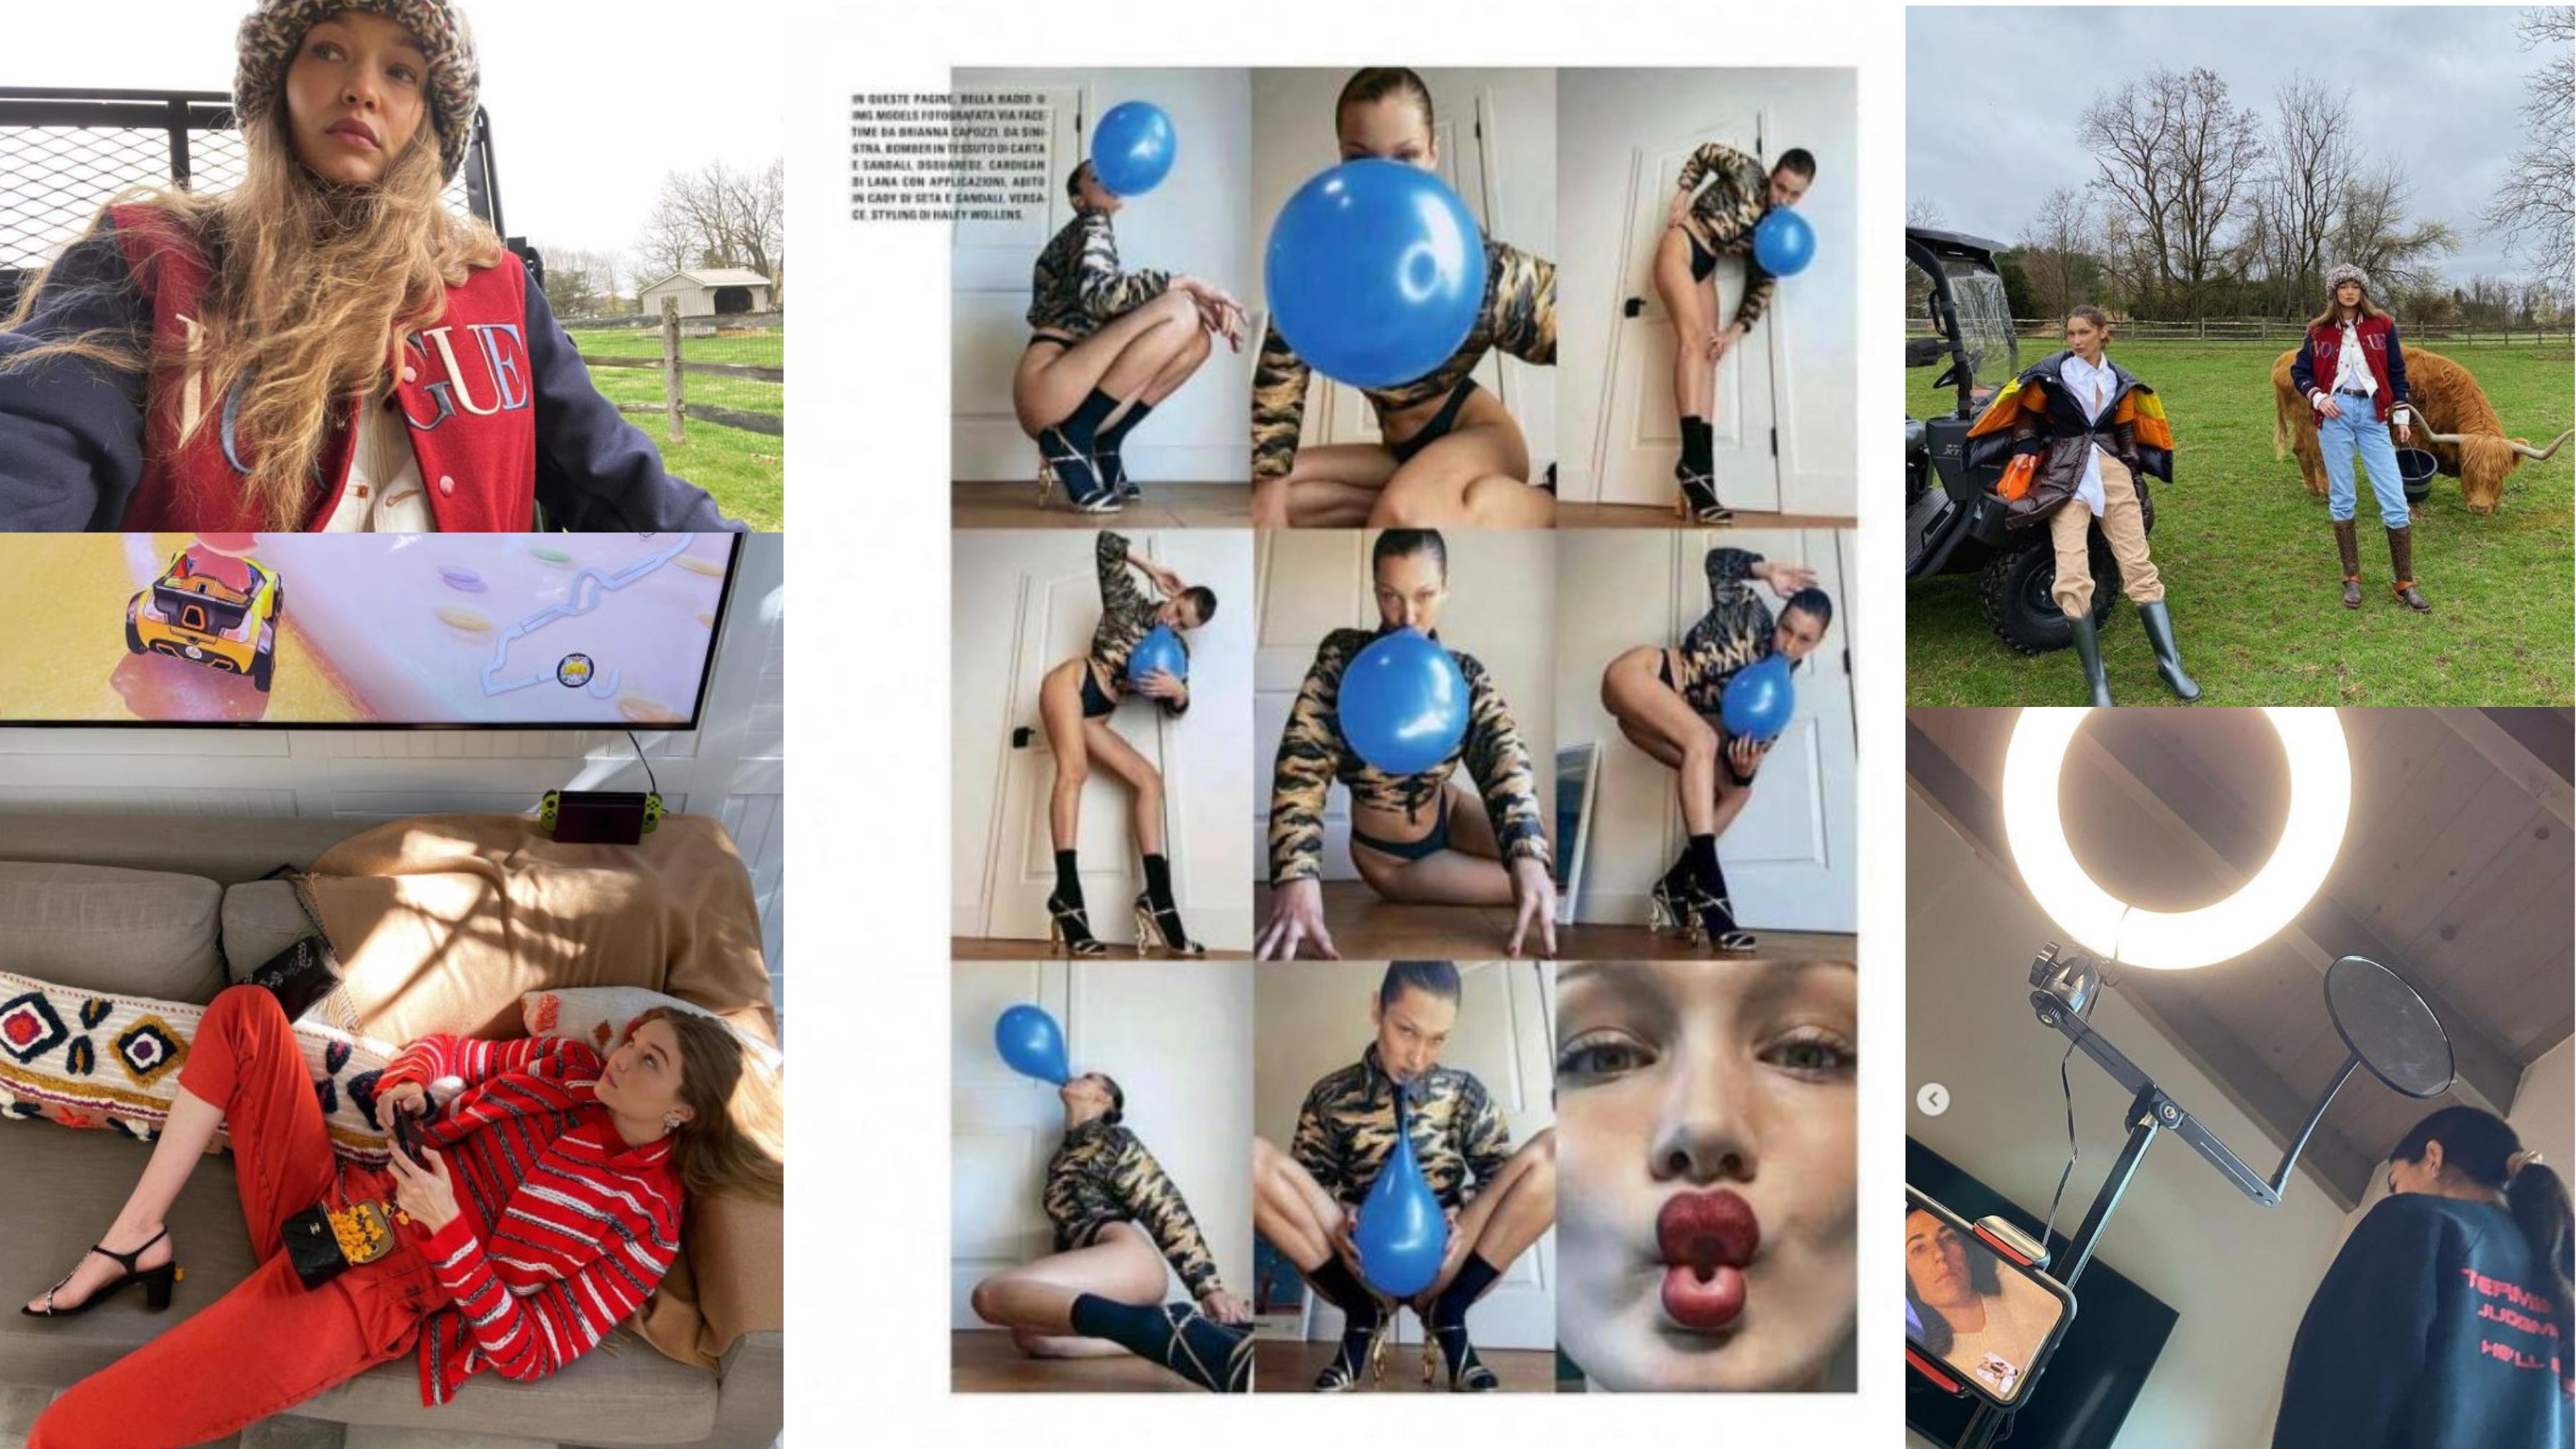 celebrity endorsements, covid-19, social media campaigns, celebrities, marketing, gigi hadid, bella hadid, vogue, vogue italia, photoshoot